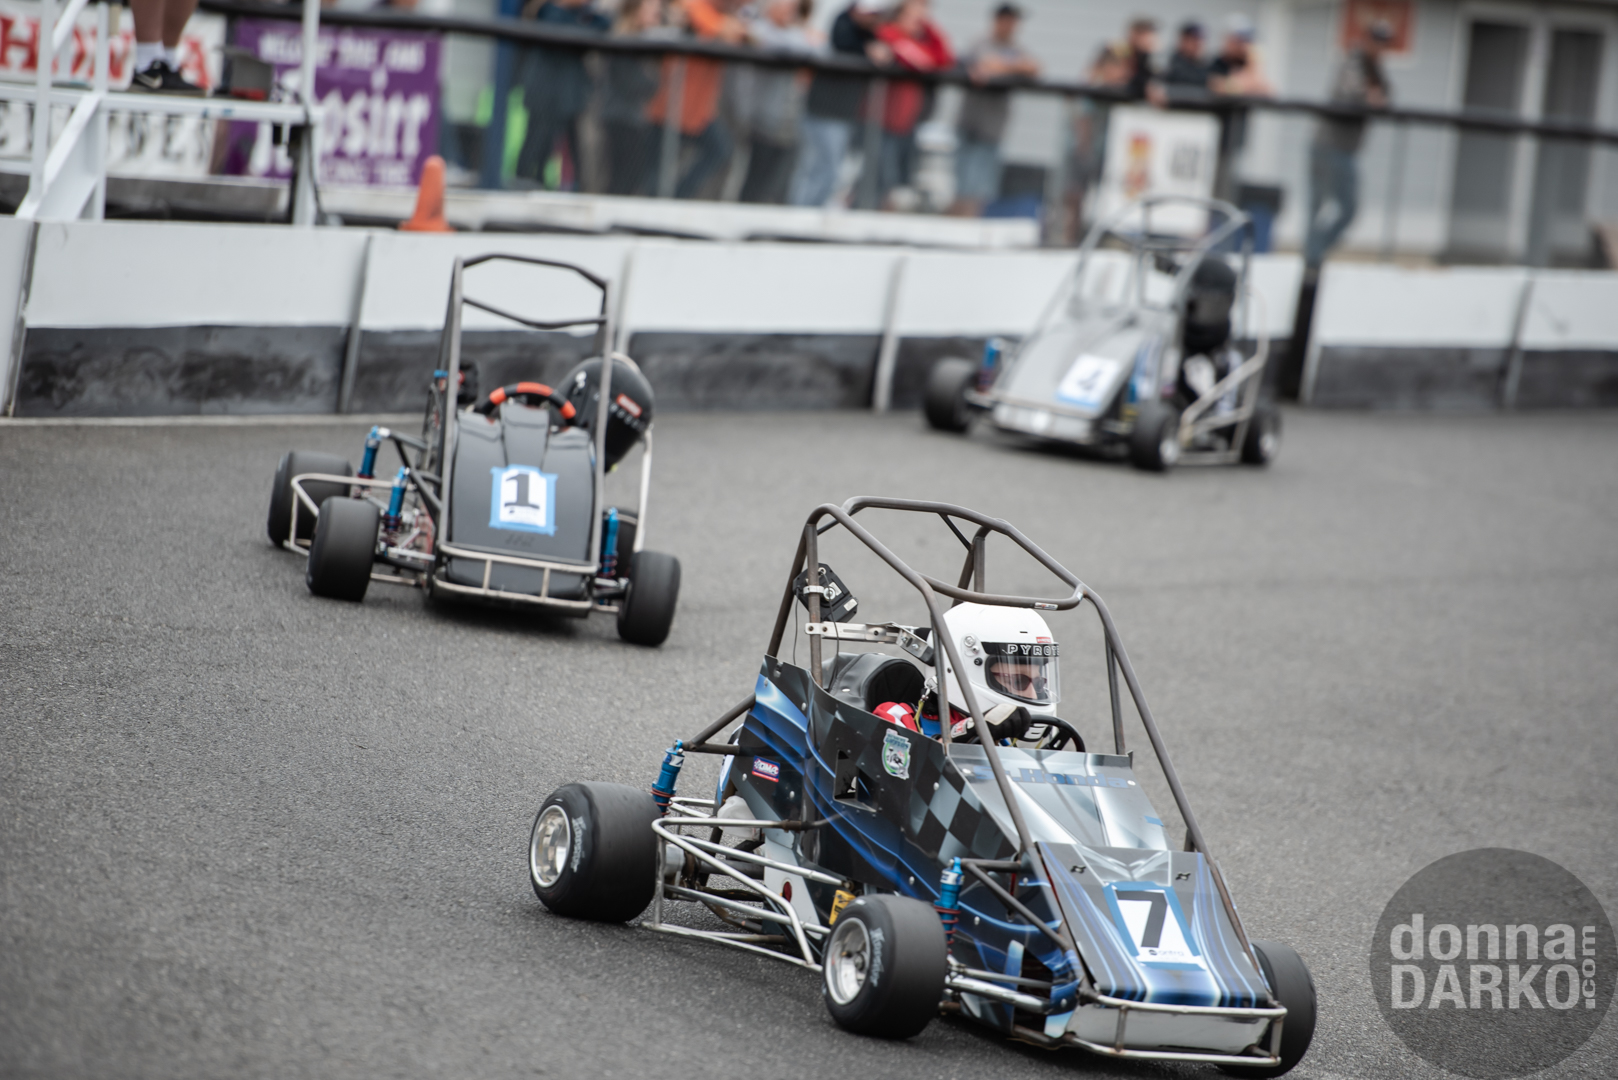 QWMA (Racing) 8-11-2019 DSC_5857.jpg